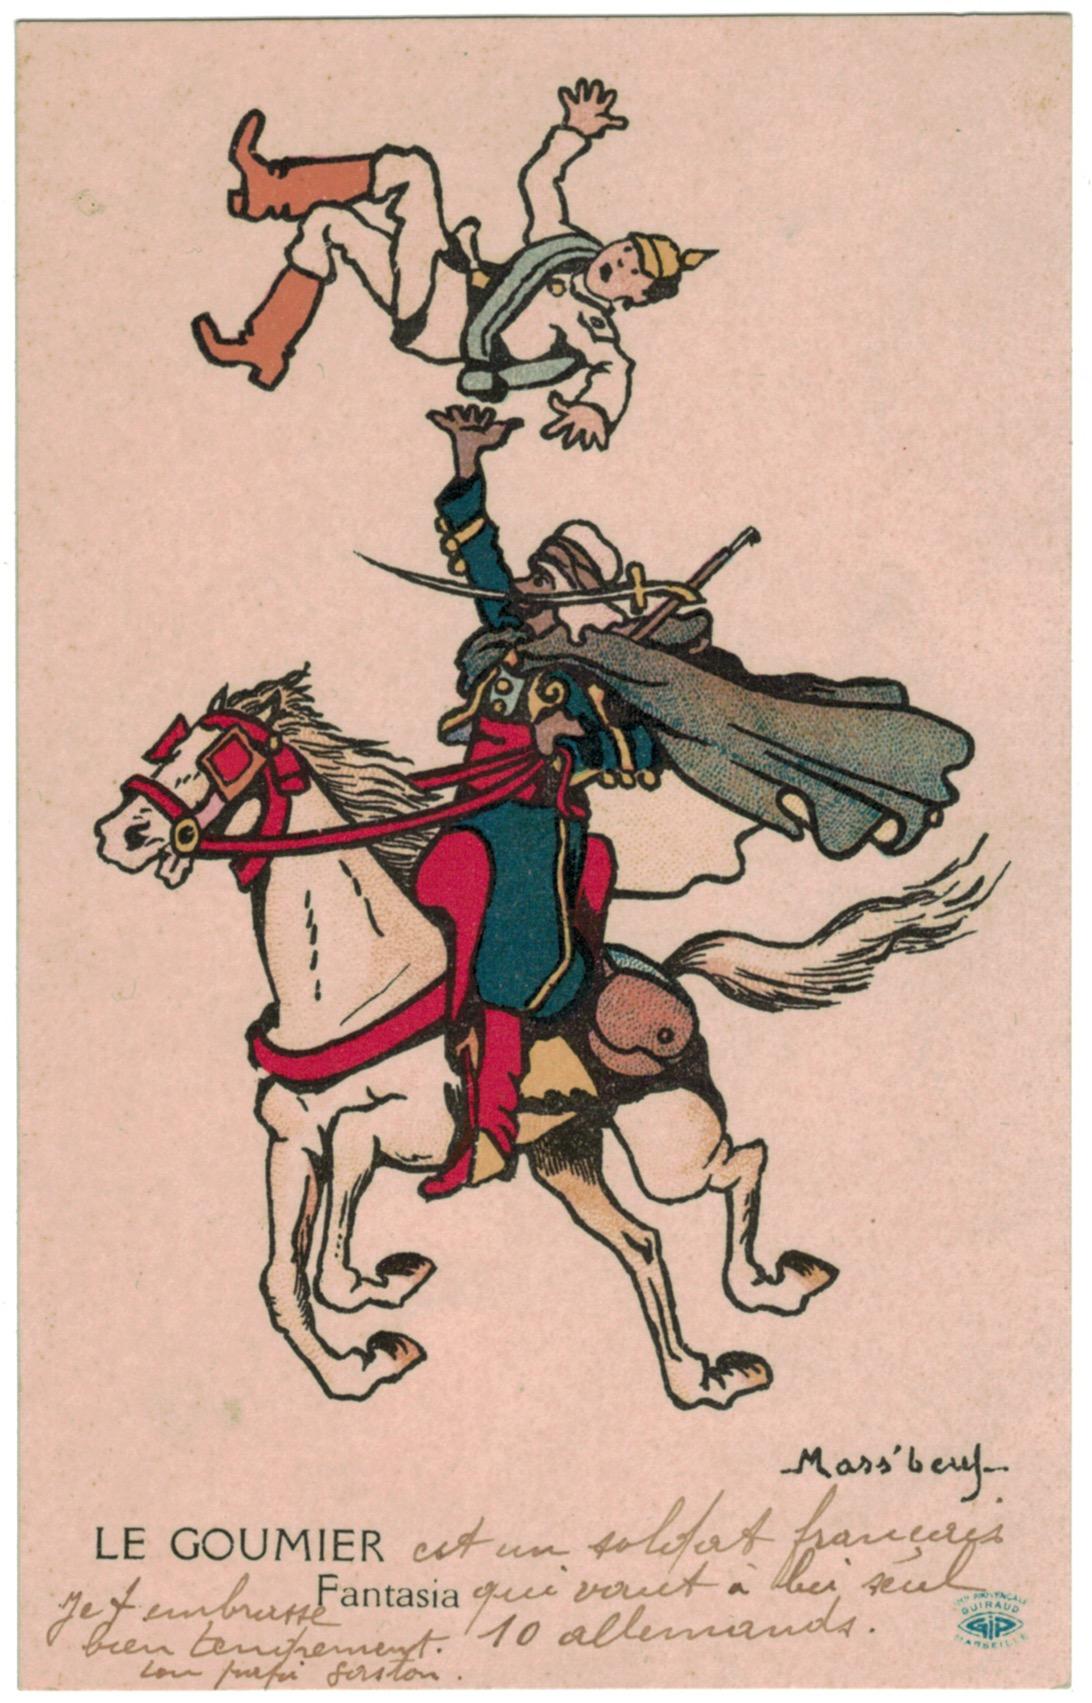 4 Cartes Postale France Lithographie - iconographie 14/18 - Parodie - Caricature - Prusse - Casque à pointe - 1914